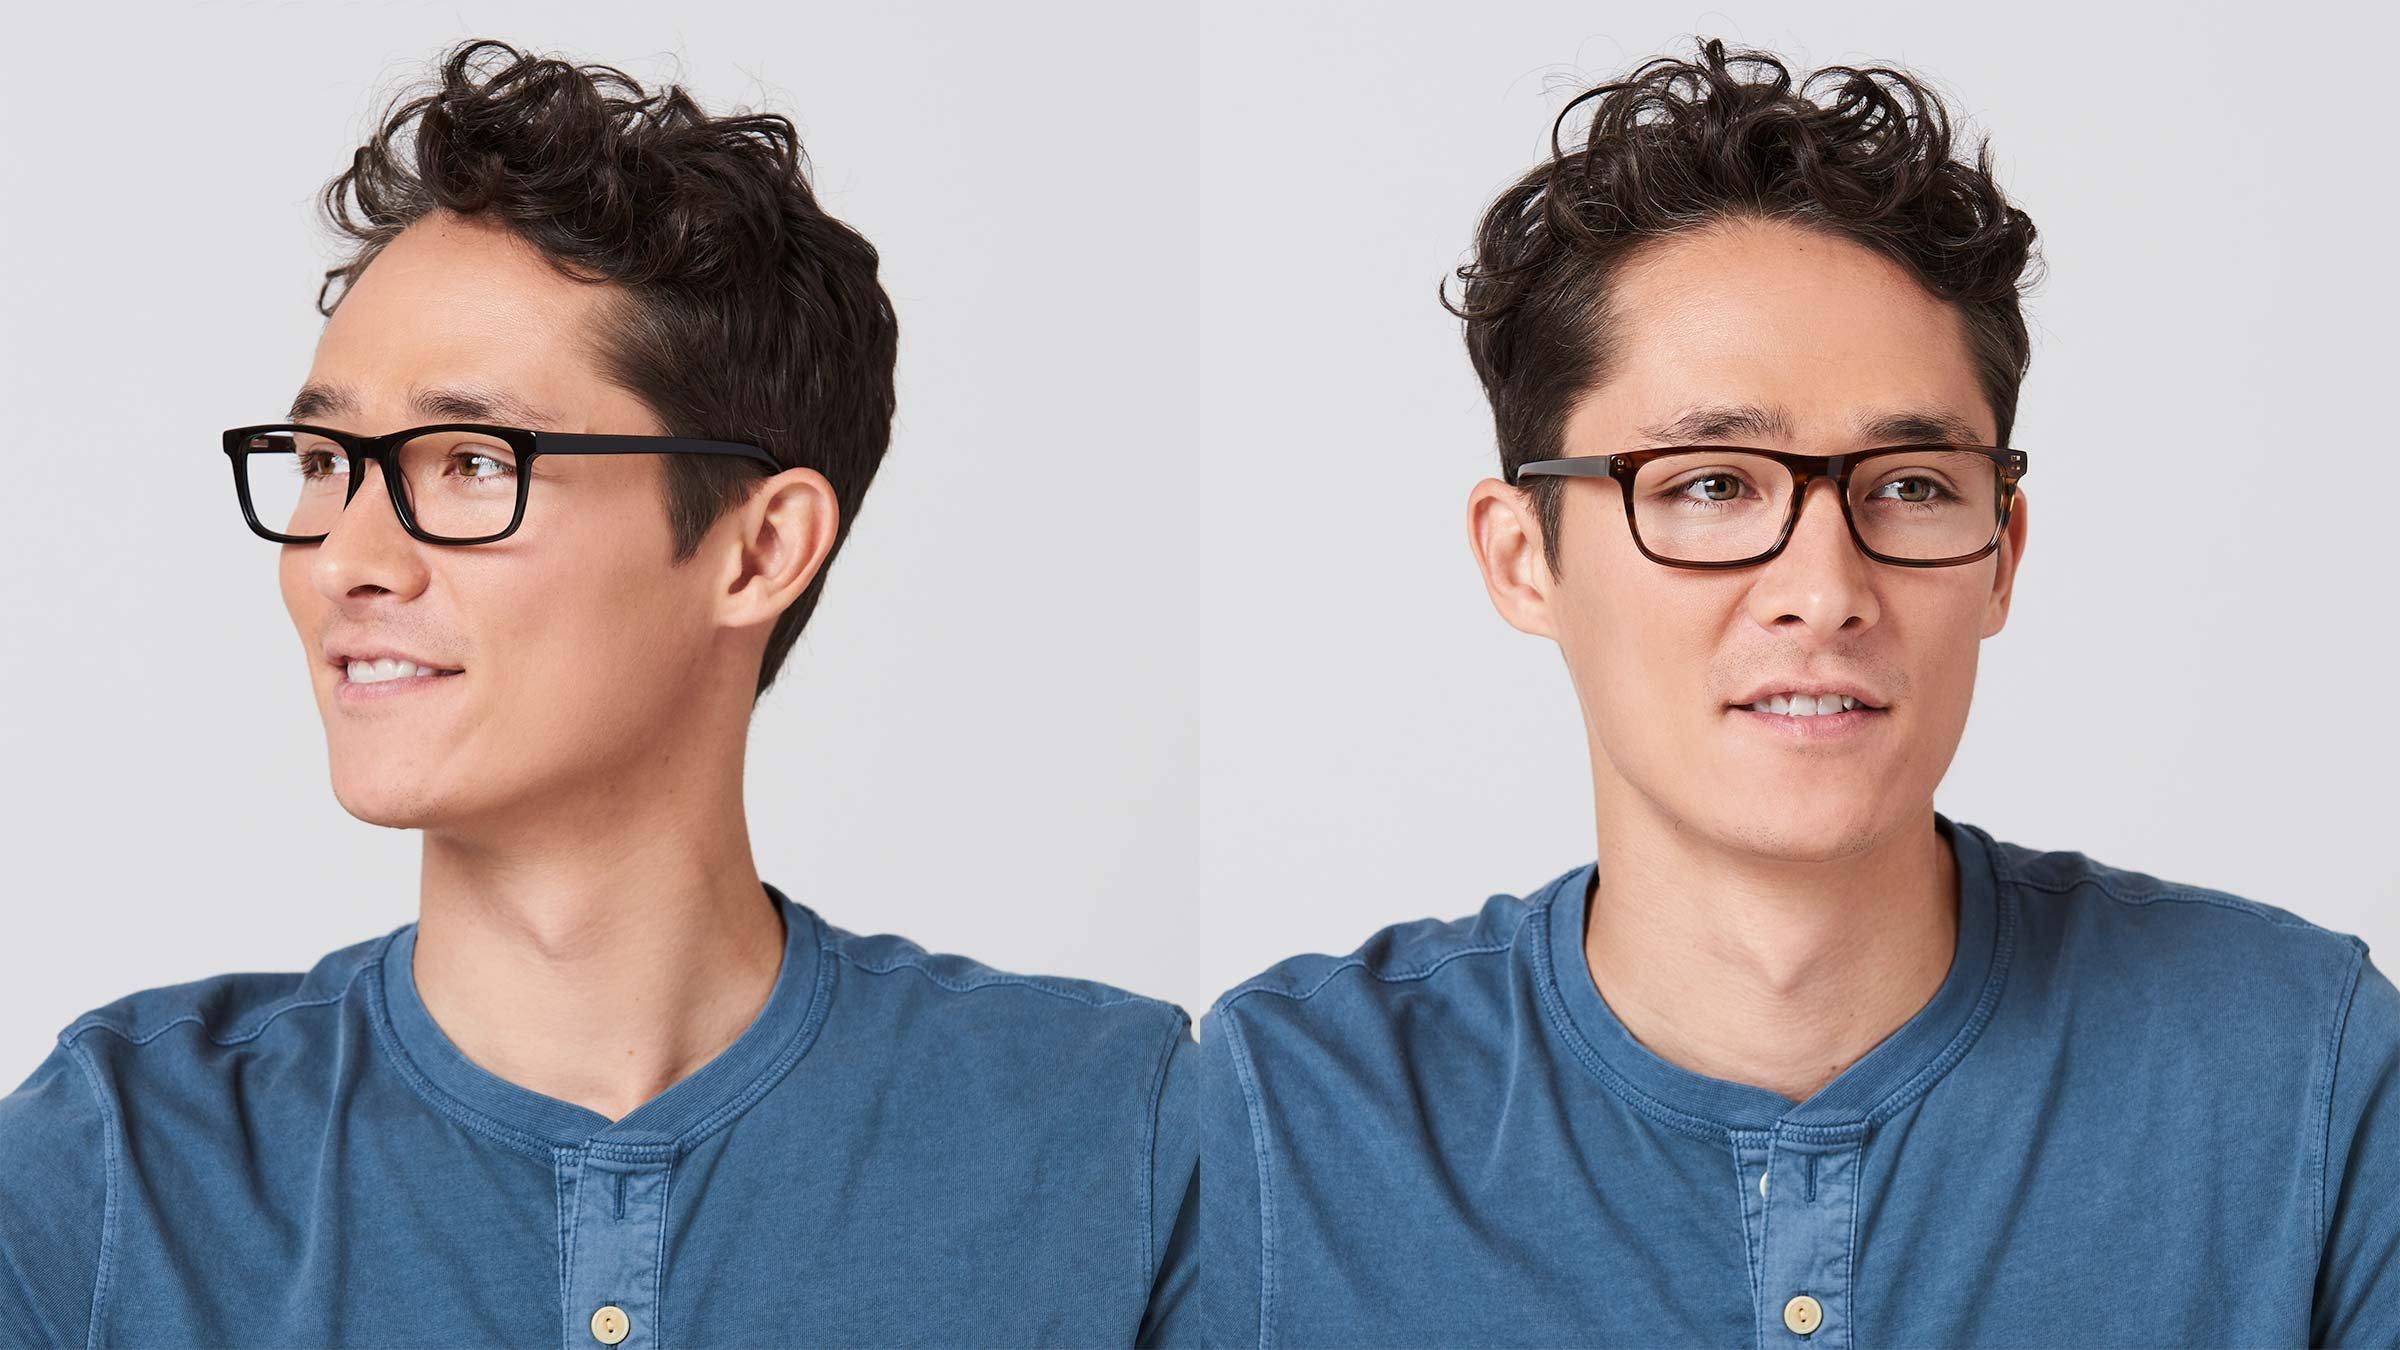 Pixel Eyewear Designer Computer Glasses with Anti-Blue Light Tint UV Protection, Anti-Glare, Full Rim, Acetate Frame Black Color - Buteo Style by Pixel Eyewear (Image #6)